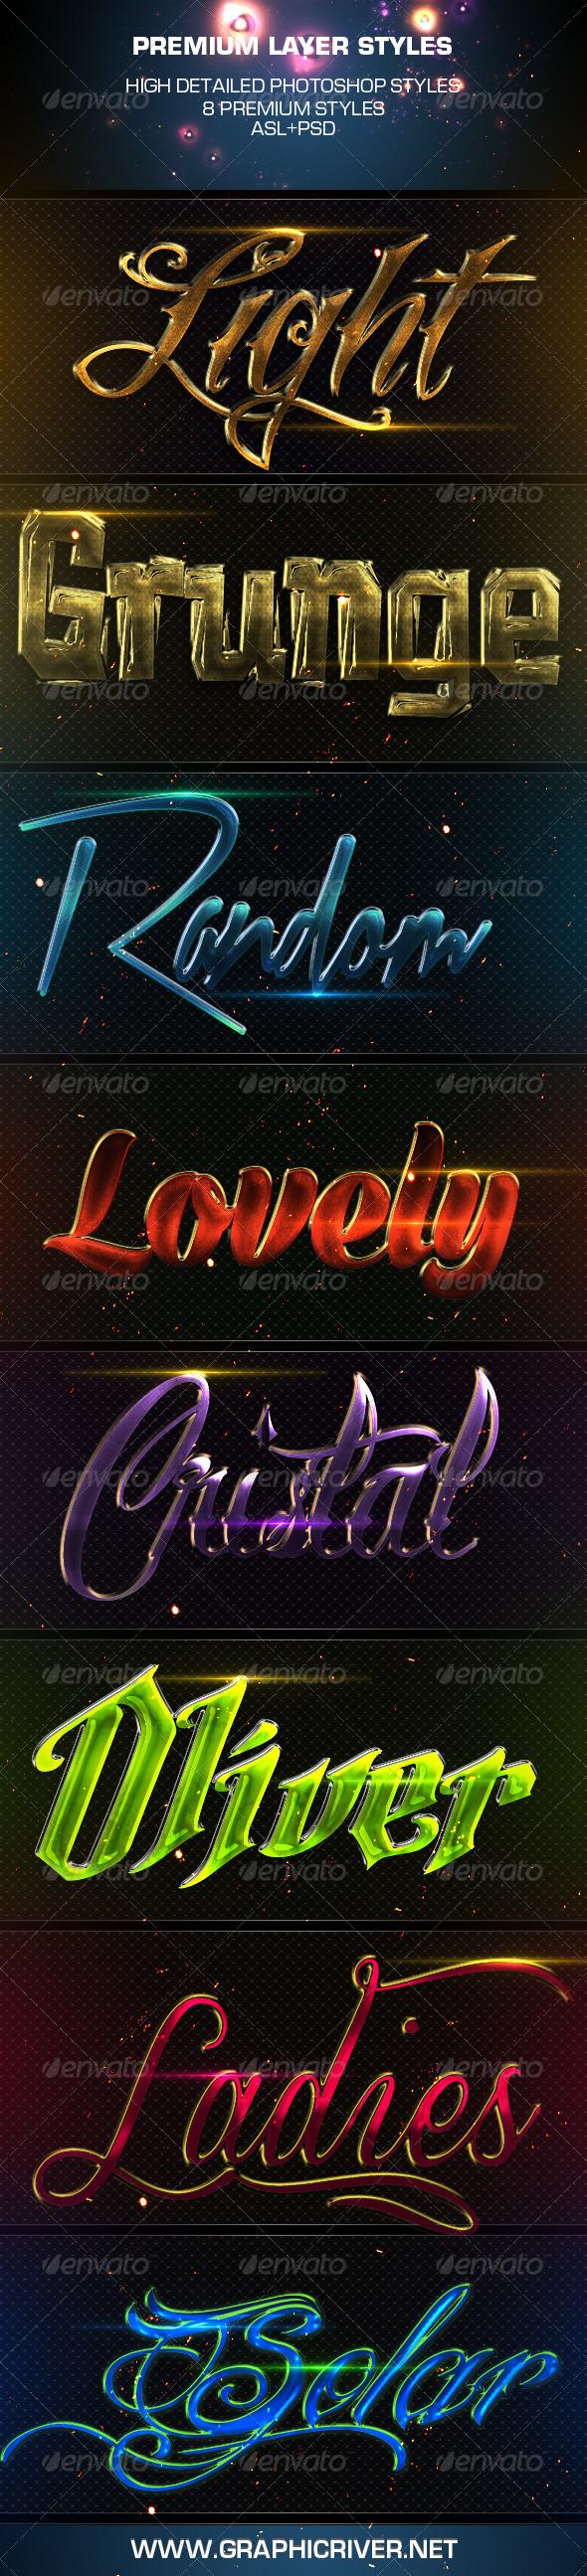 GraphicRiver Premium Layer Styles 3786755